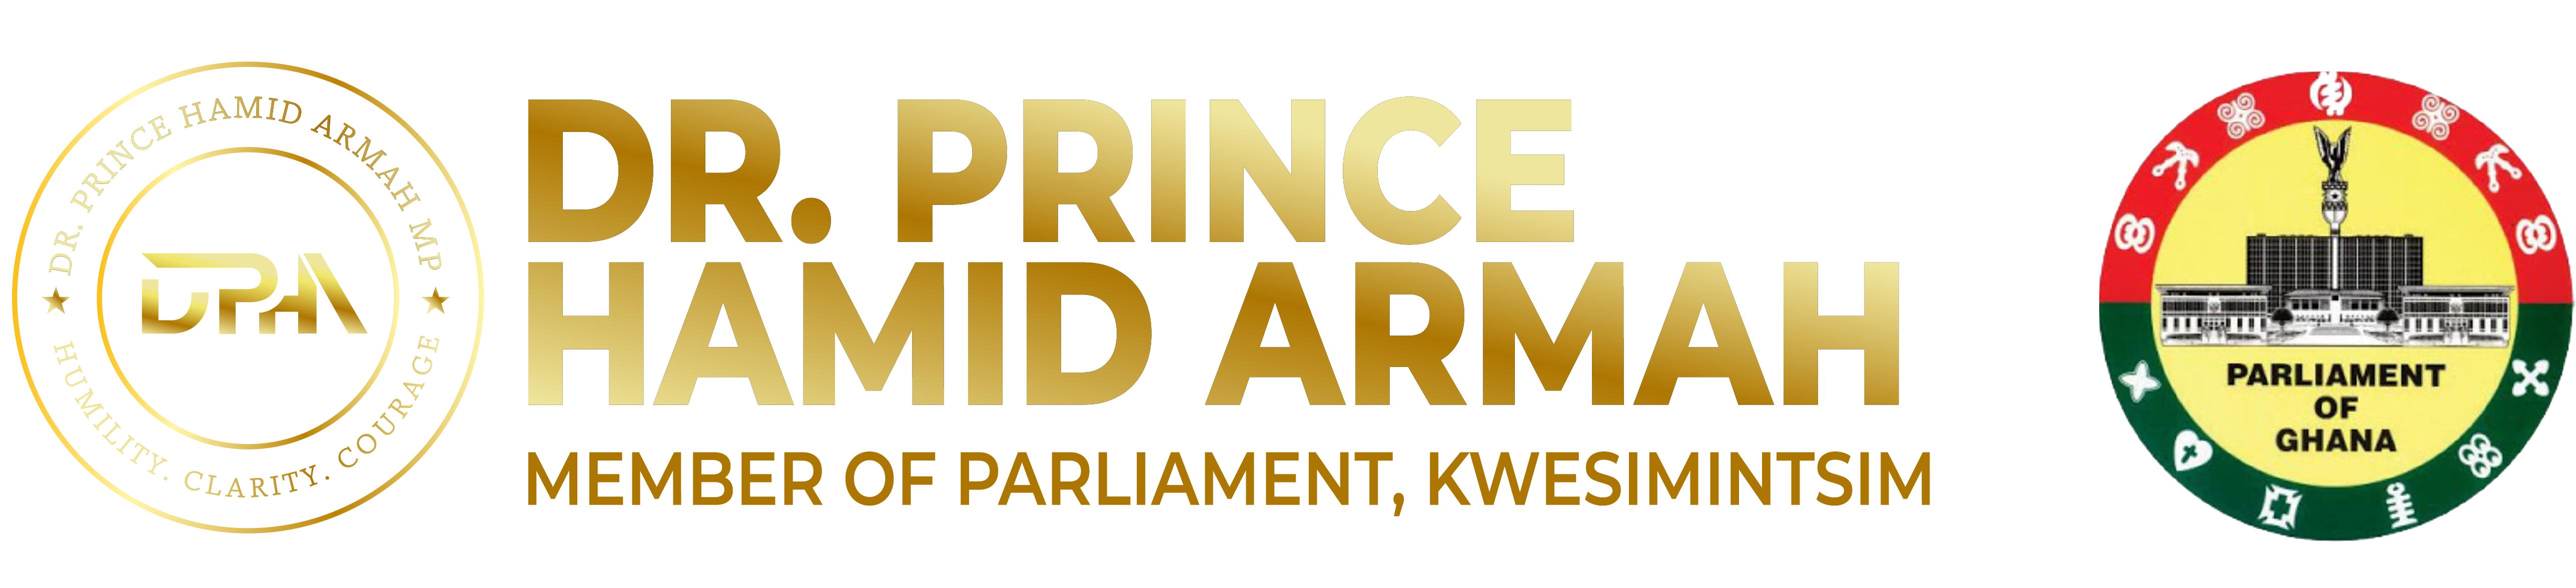 Dr Prince Hamid Armah Parliament logo